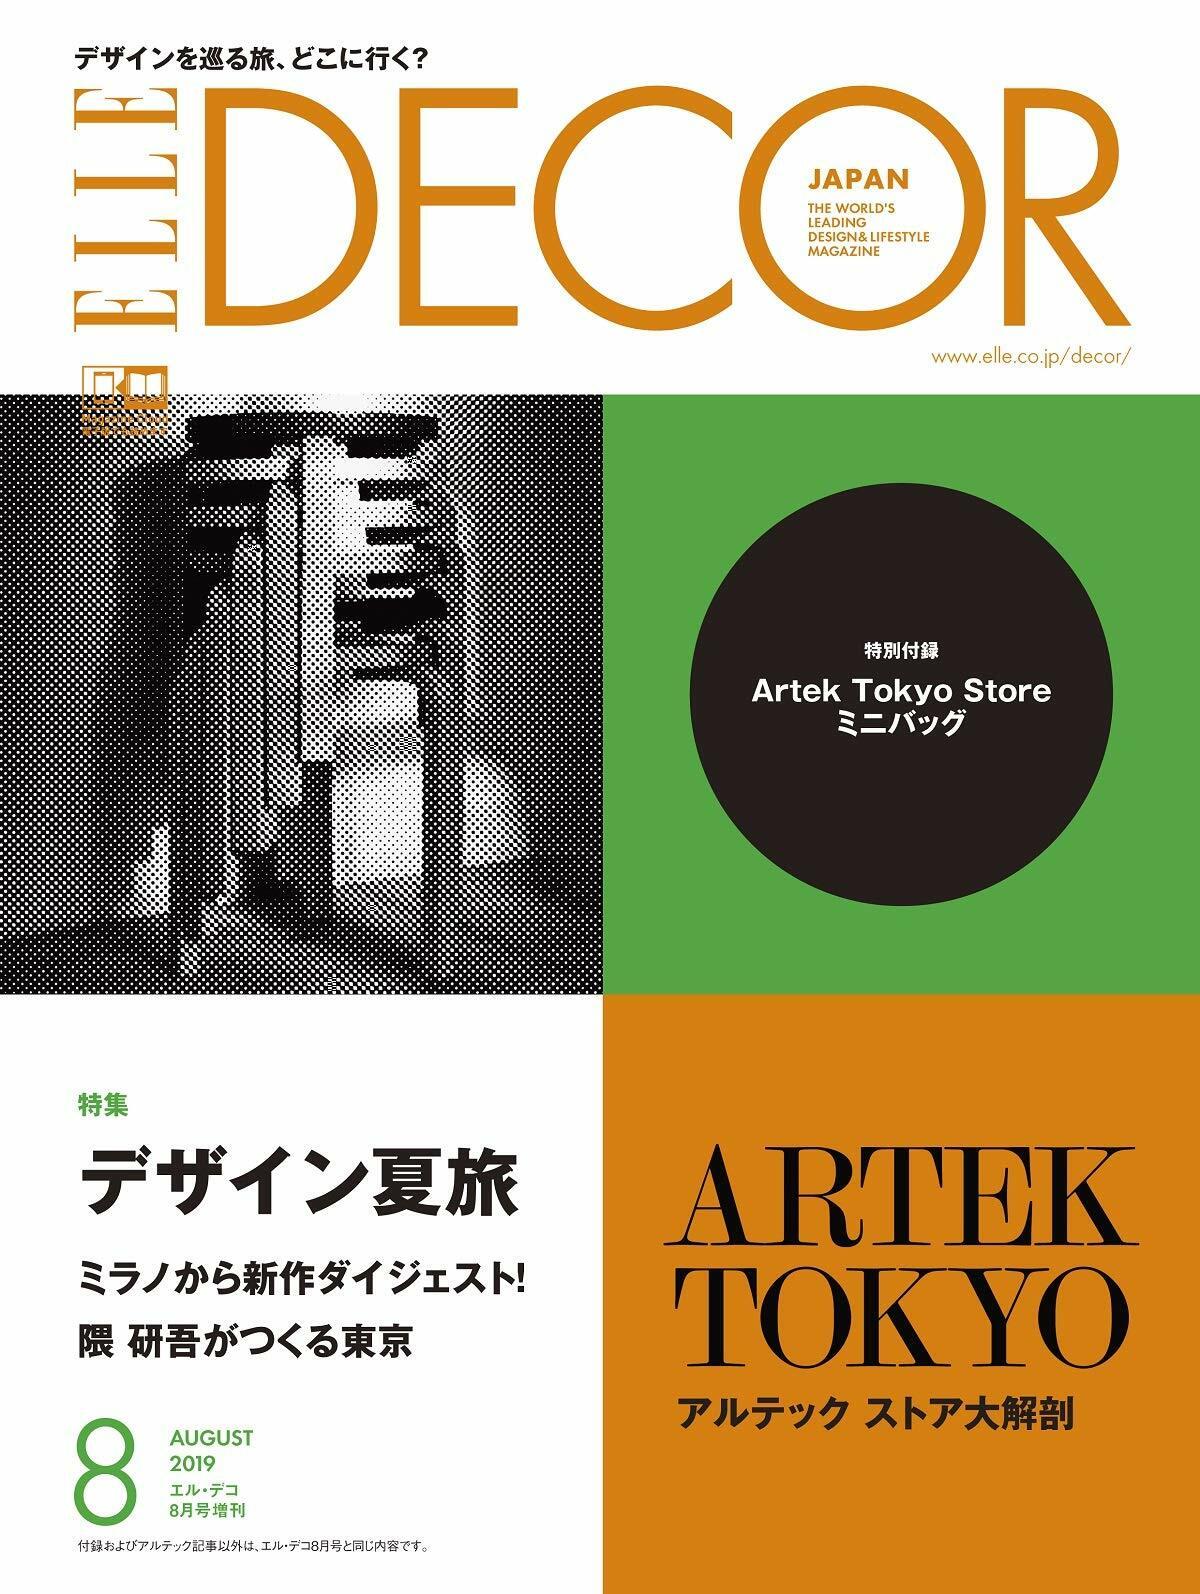 ELLE DECOR (エル·デコ) 2019年08月號增刊 Artek付錄つき特別版